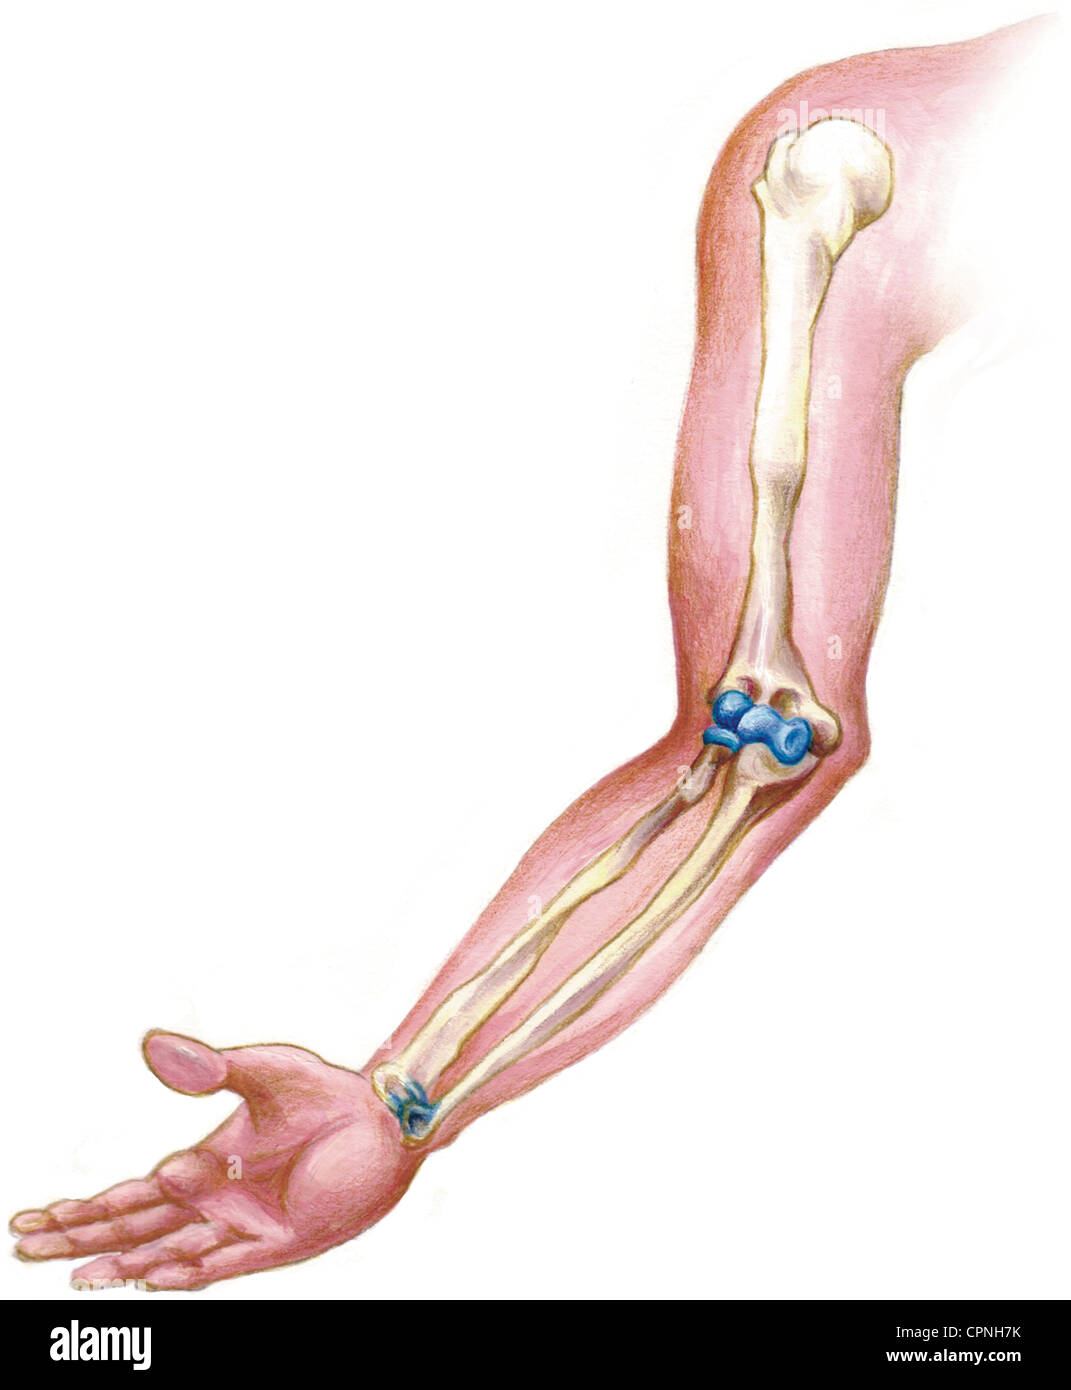 Upper Arm Bone Stock Photos & Upper Arm Bone Stock Images - Alamy